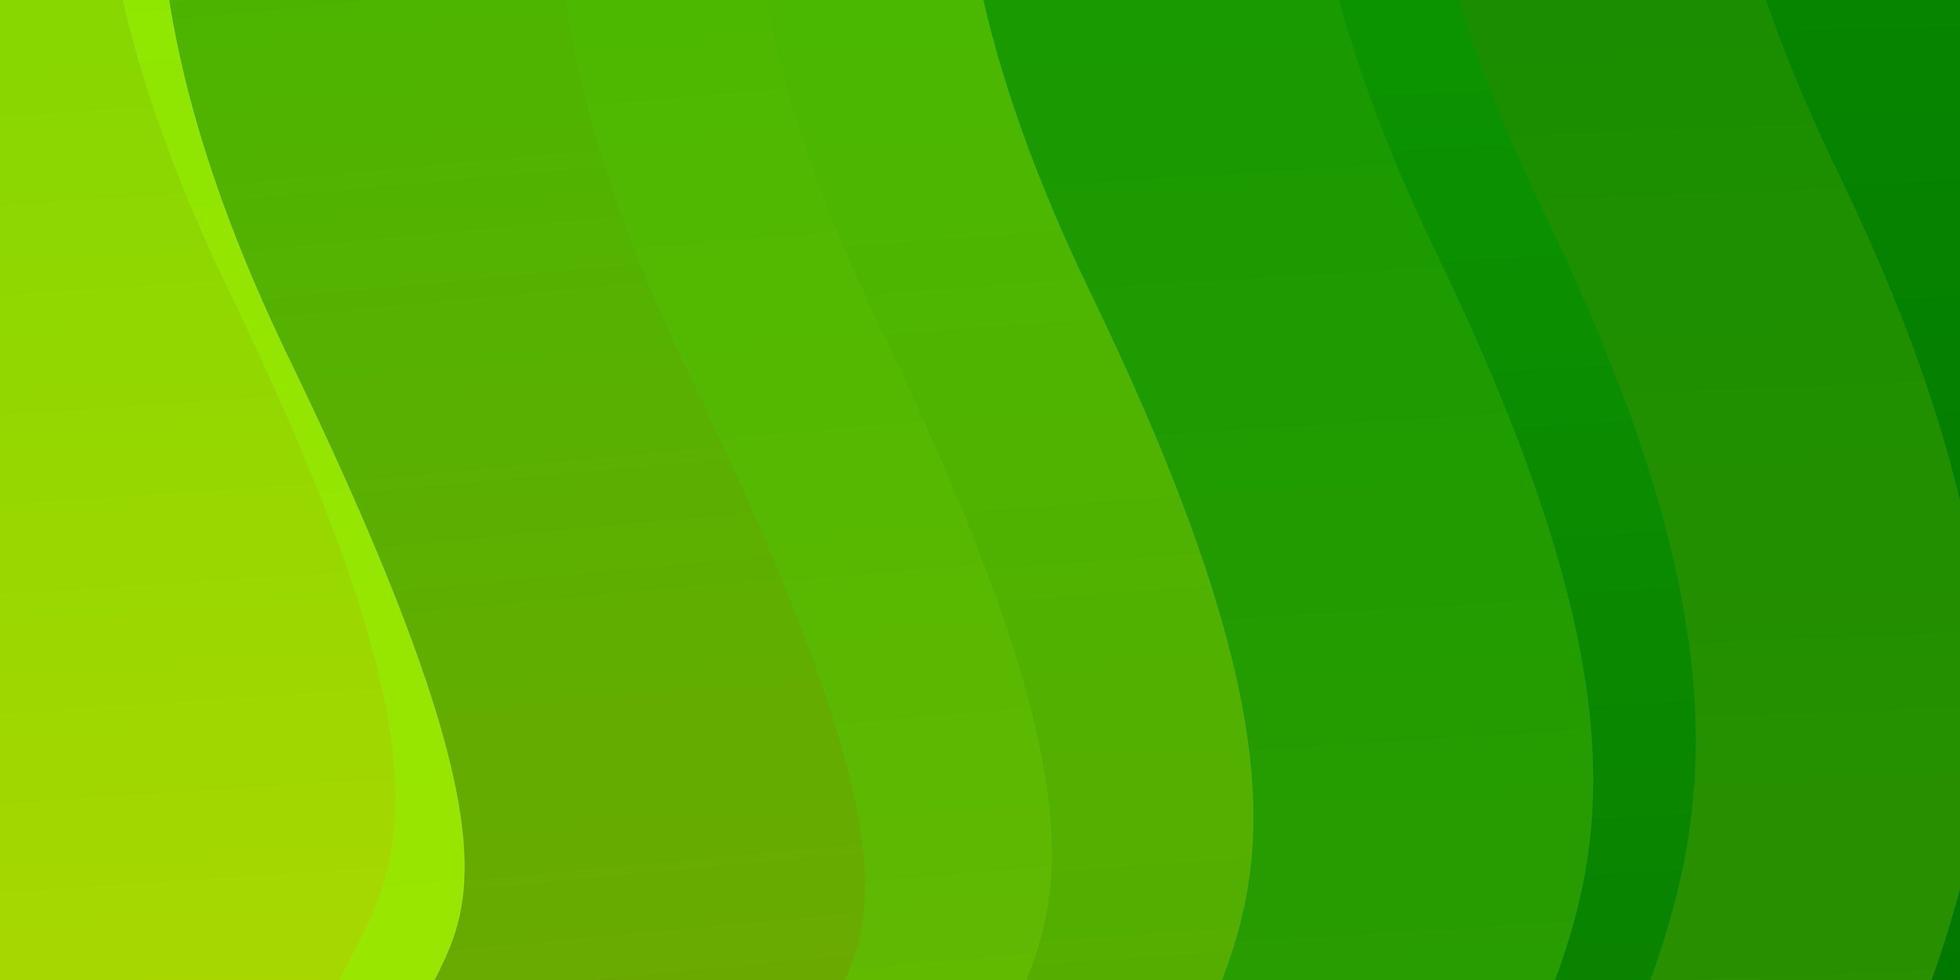 hellgrünes Vektormuster mit Kurven. vektor